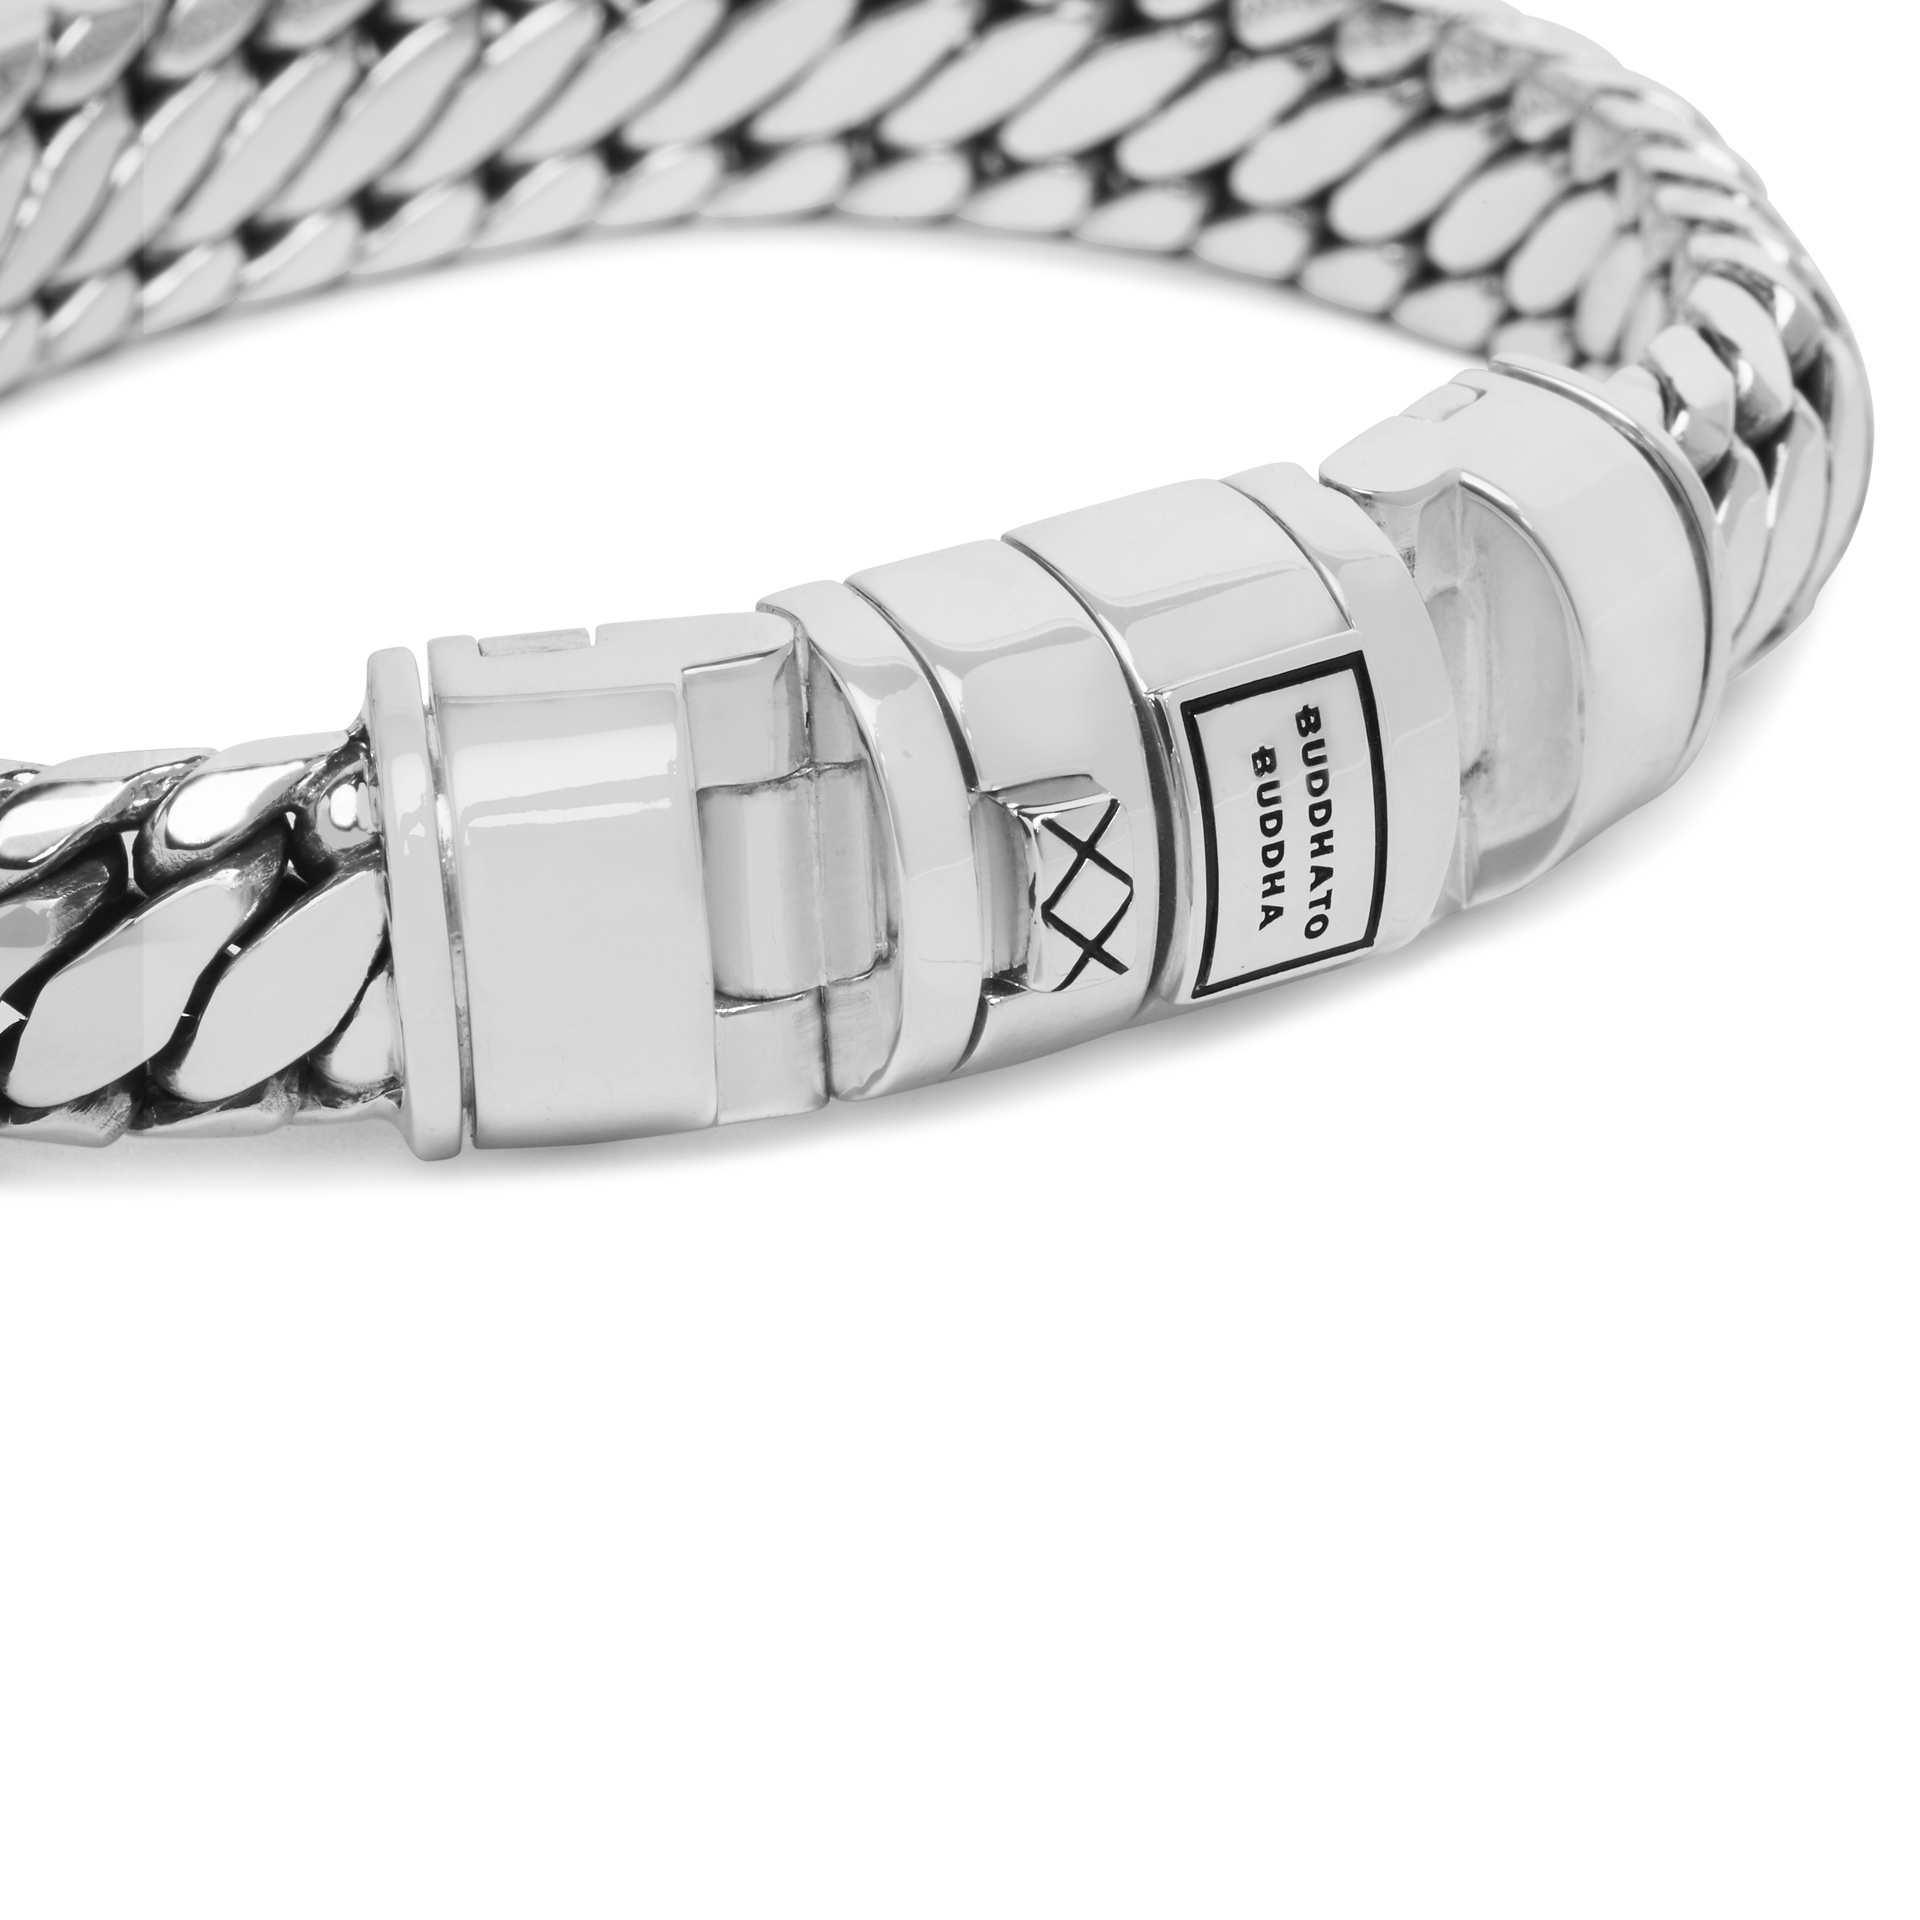 Bracelet Ben Customized Set Silver & Leather-5